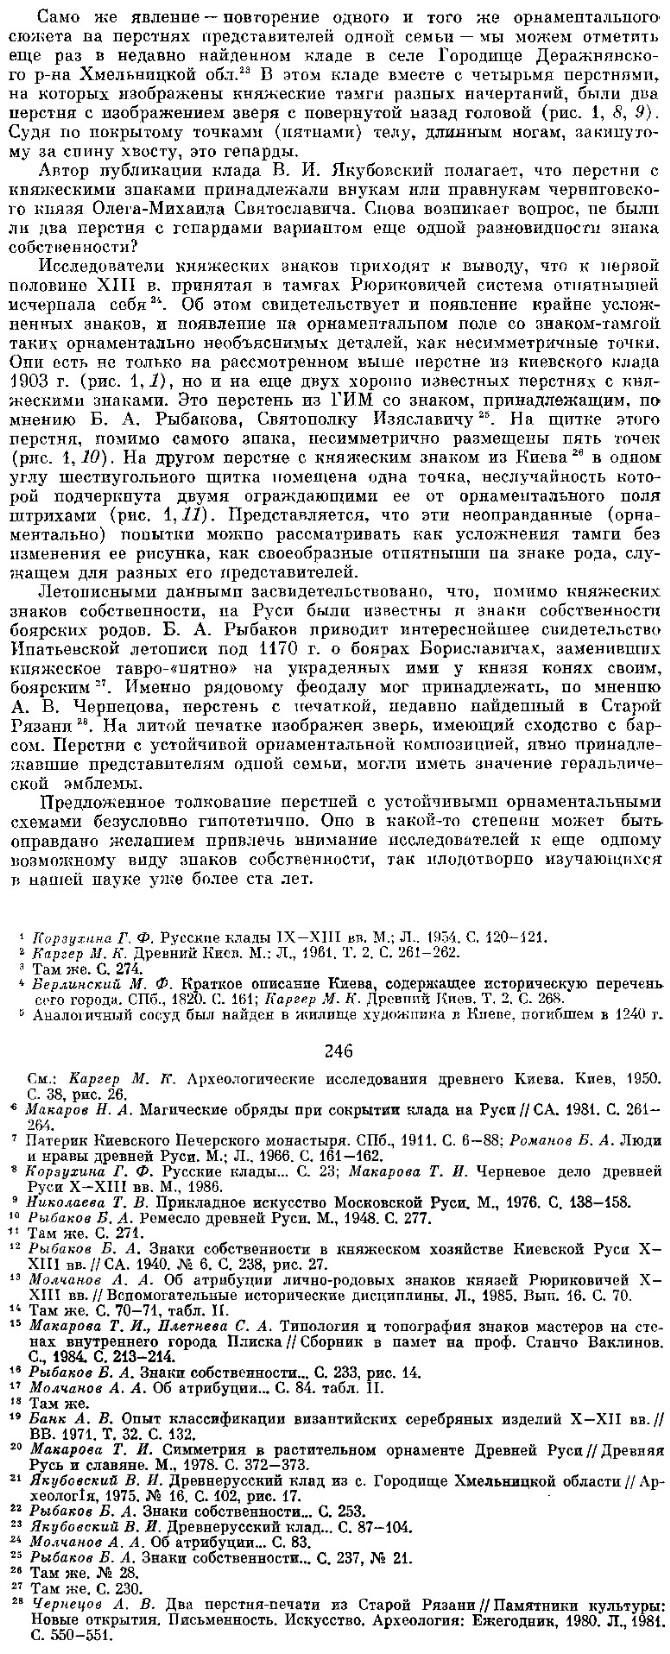 стр246